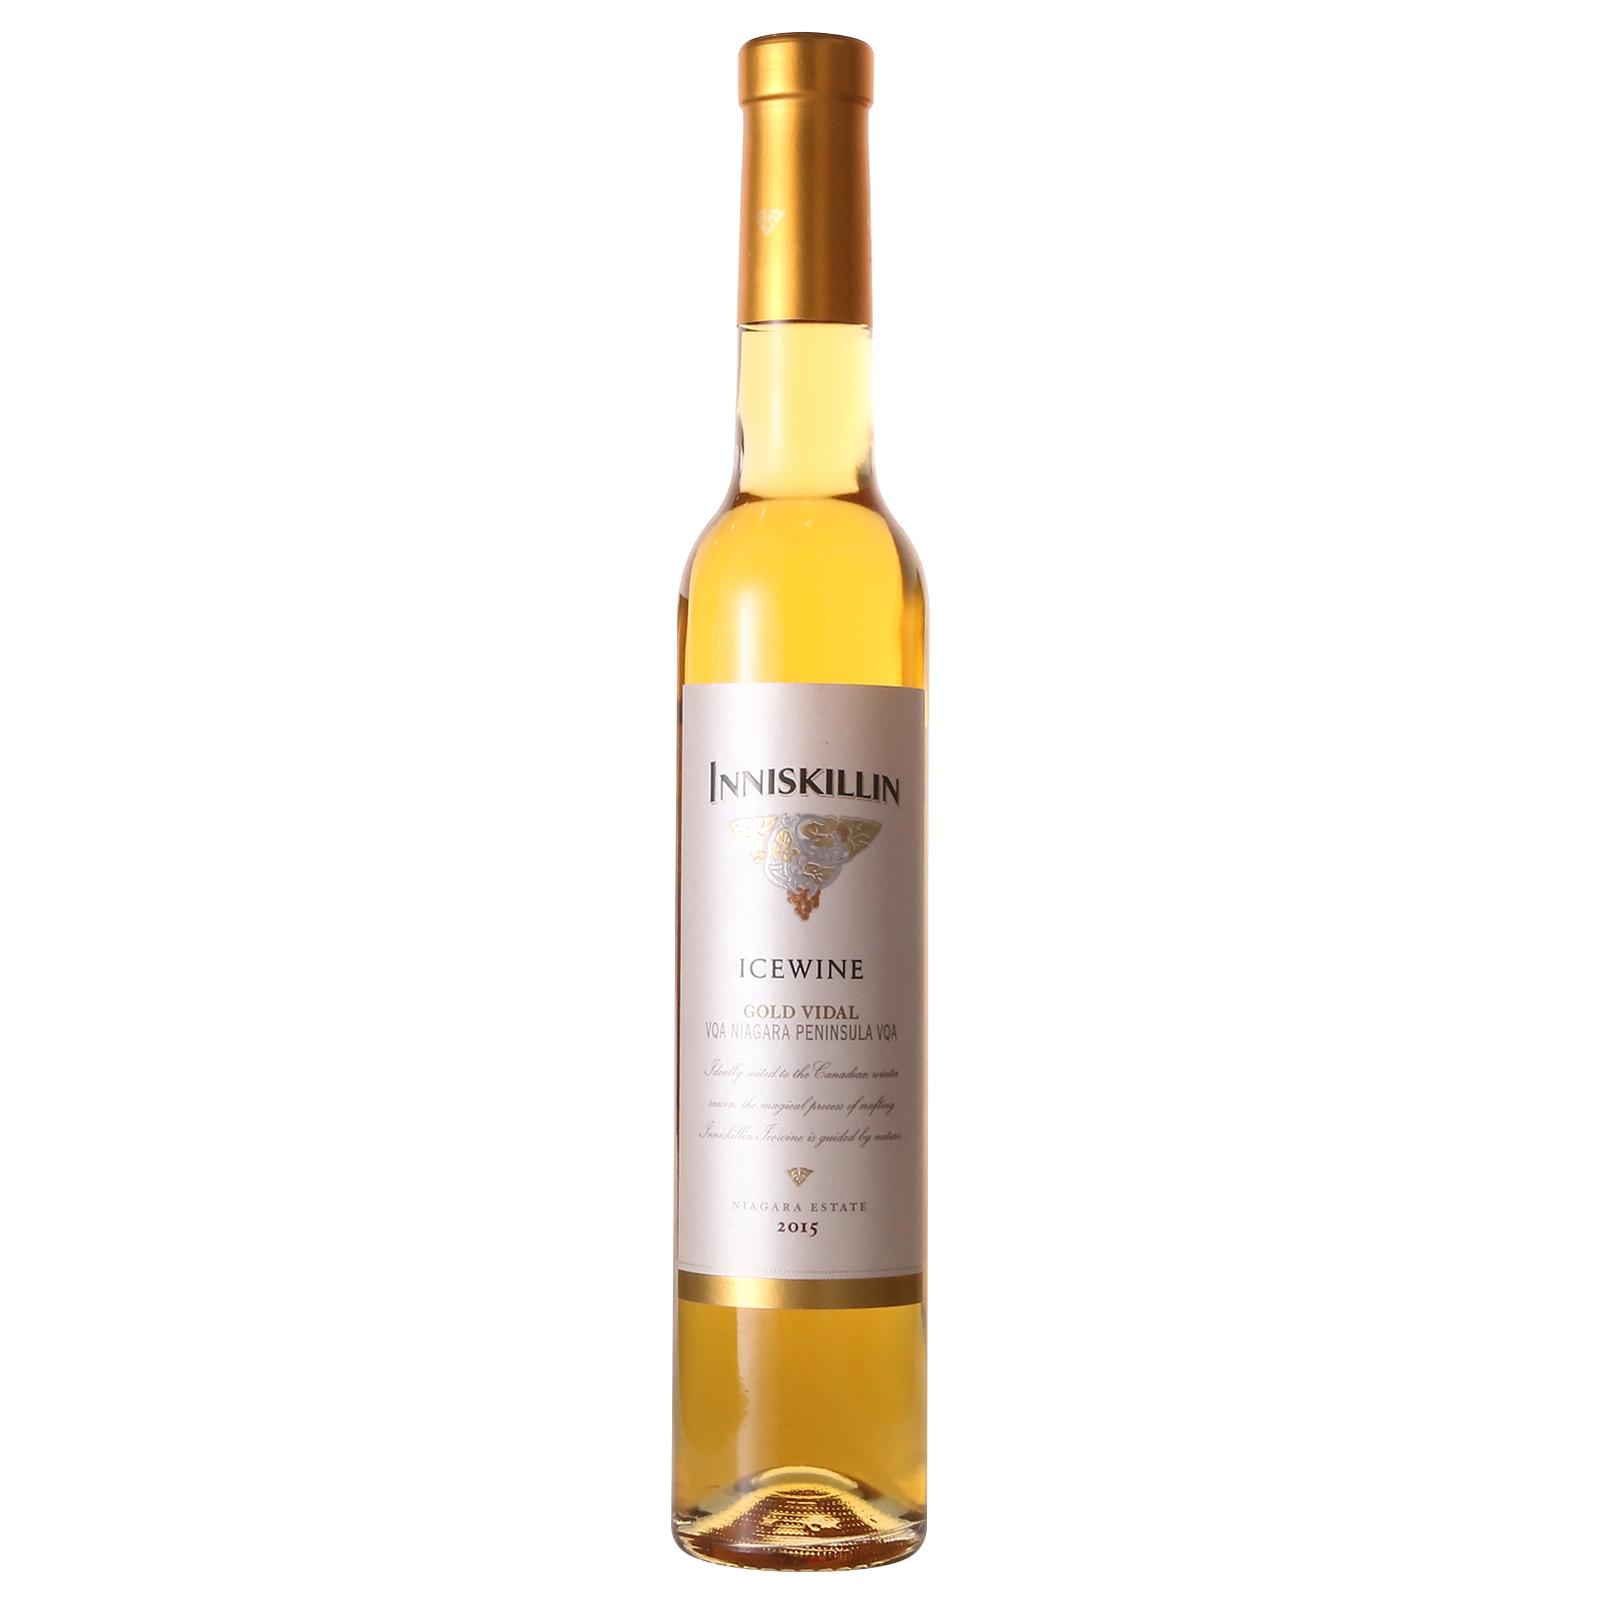 云岭冰酒(冰葡萄酒) Inniskillin Icewine Gold Oak Ag375ml